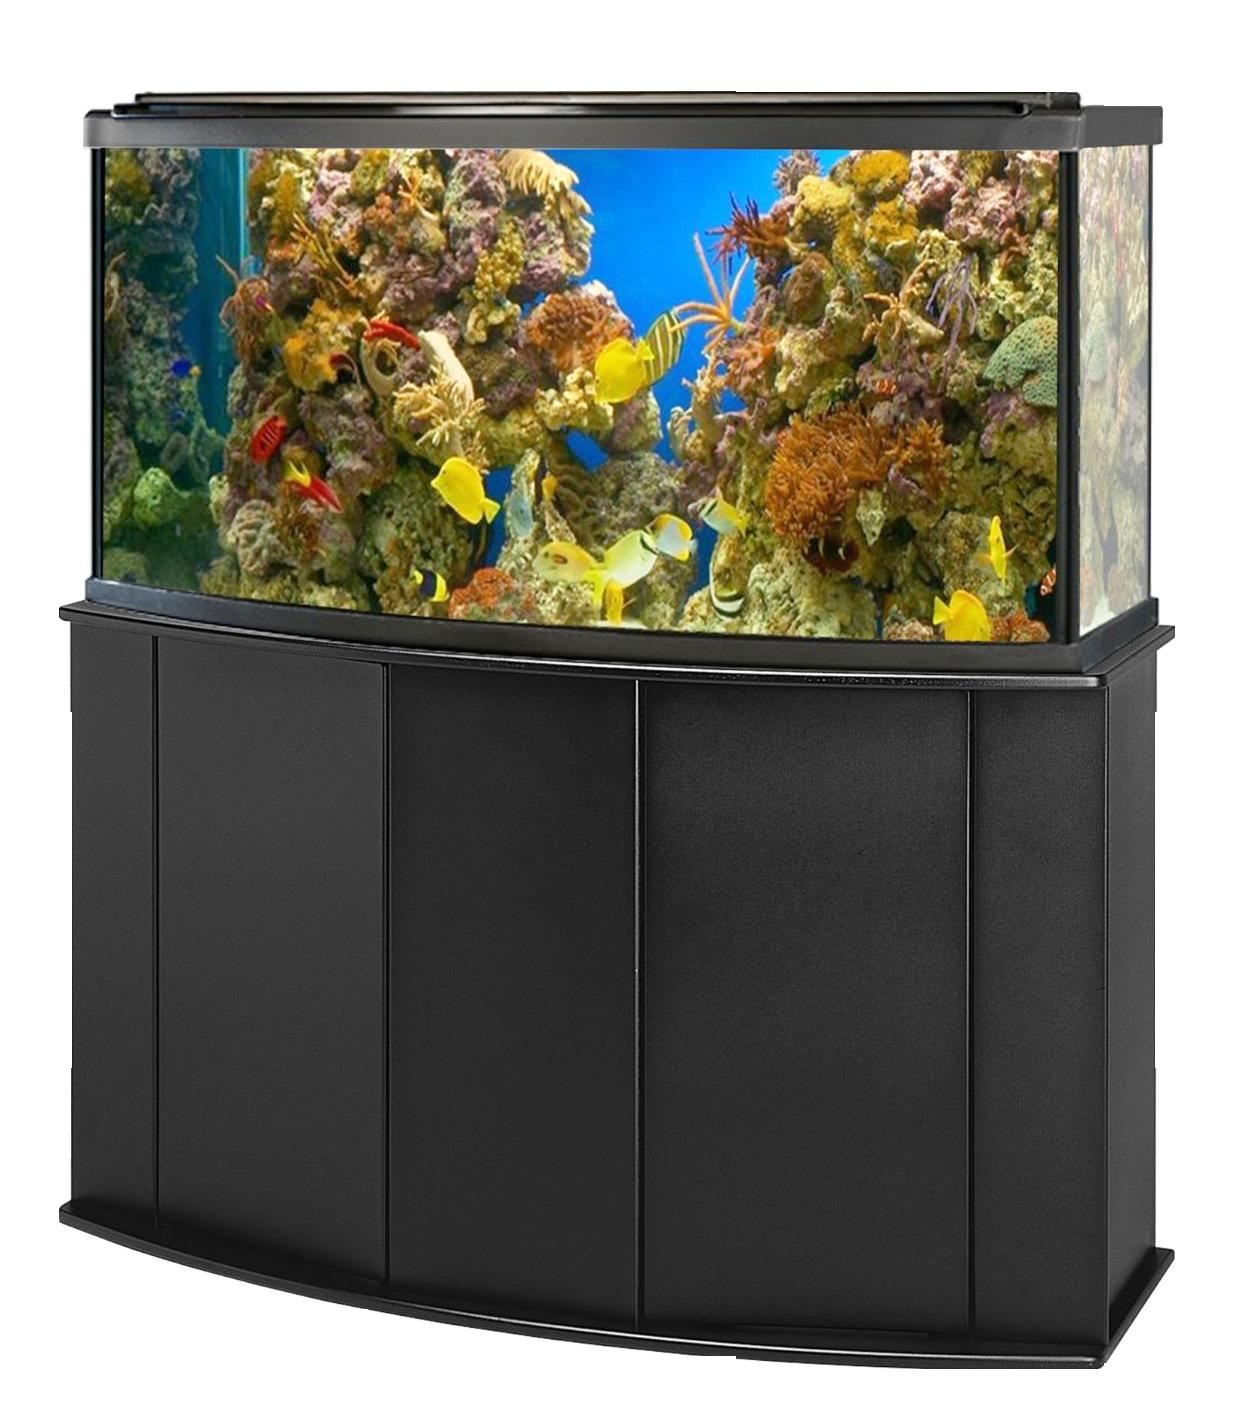 Aquarium Fish Tank PNG Image